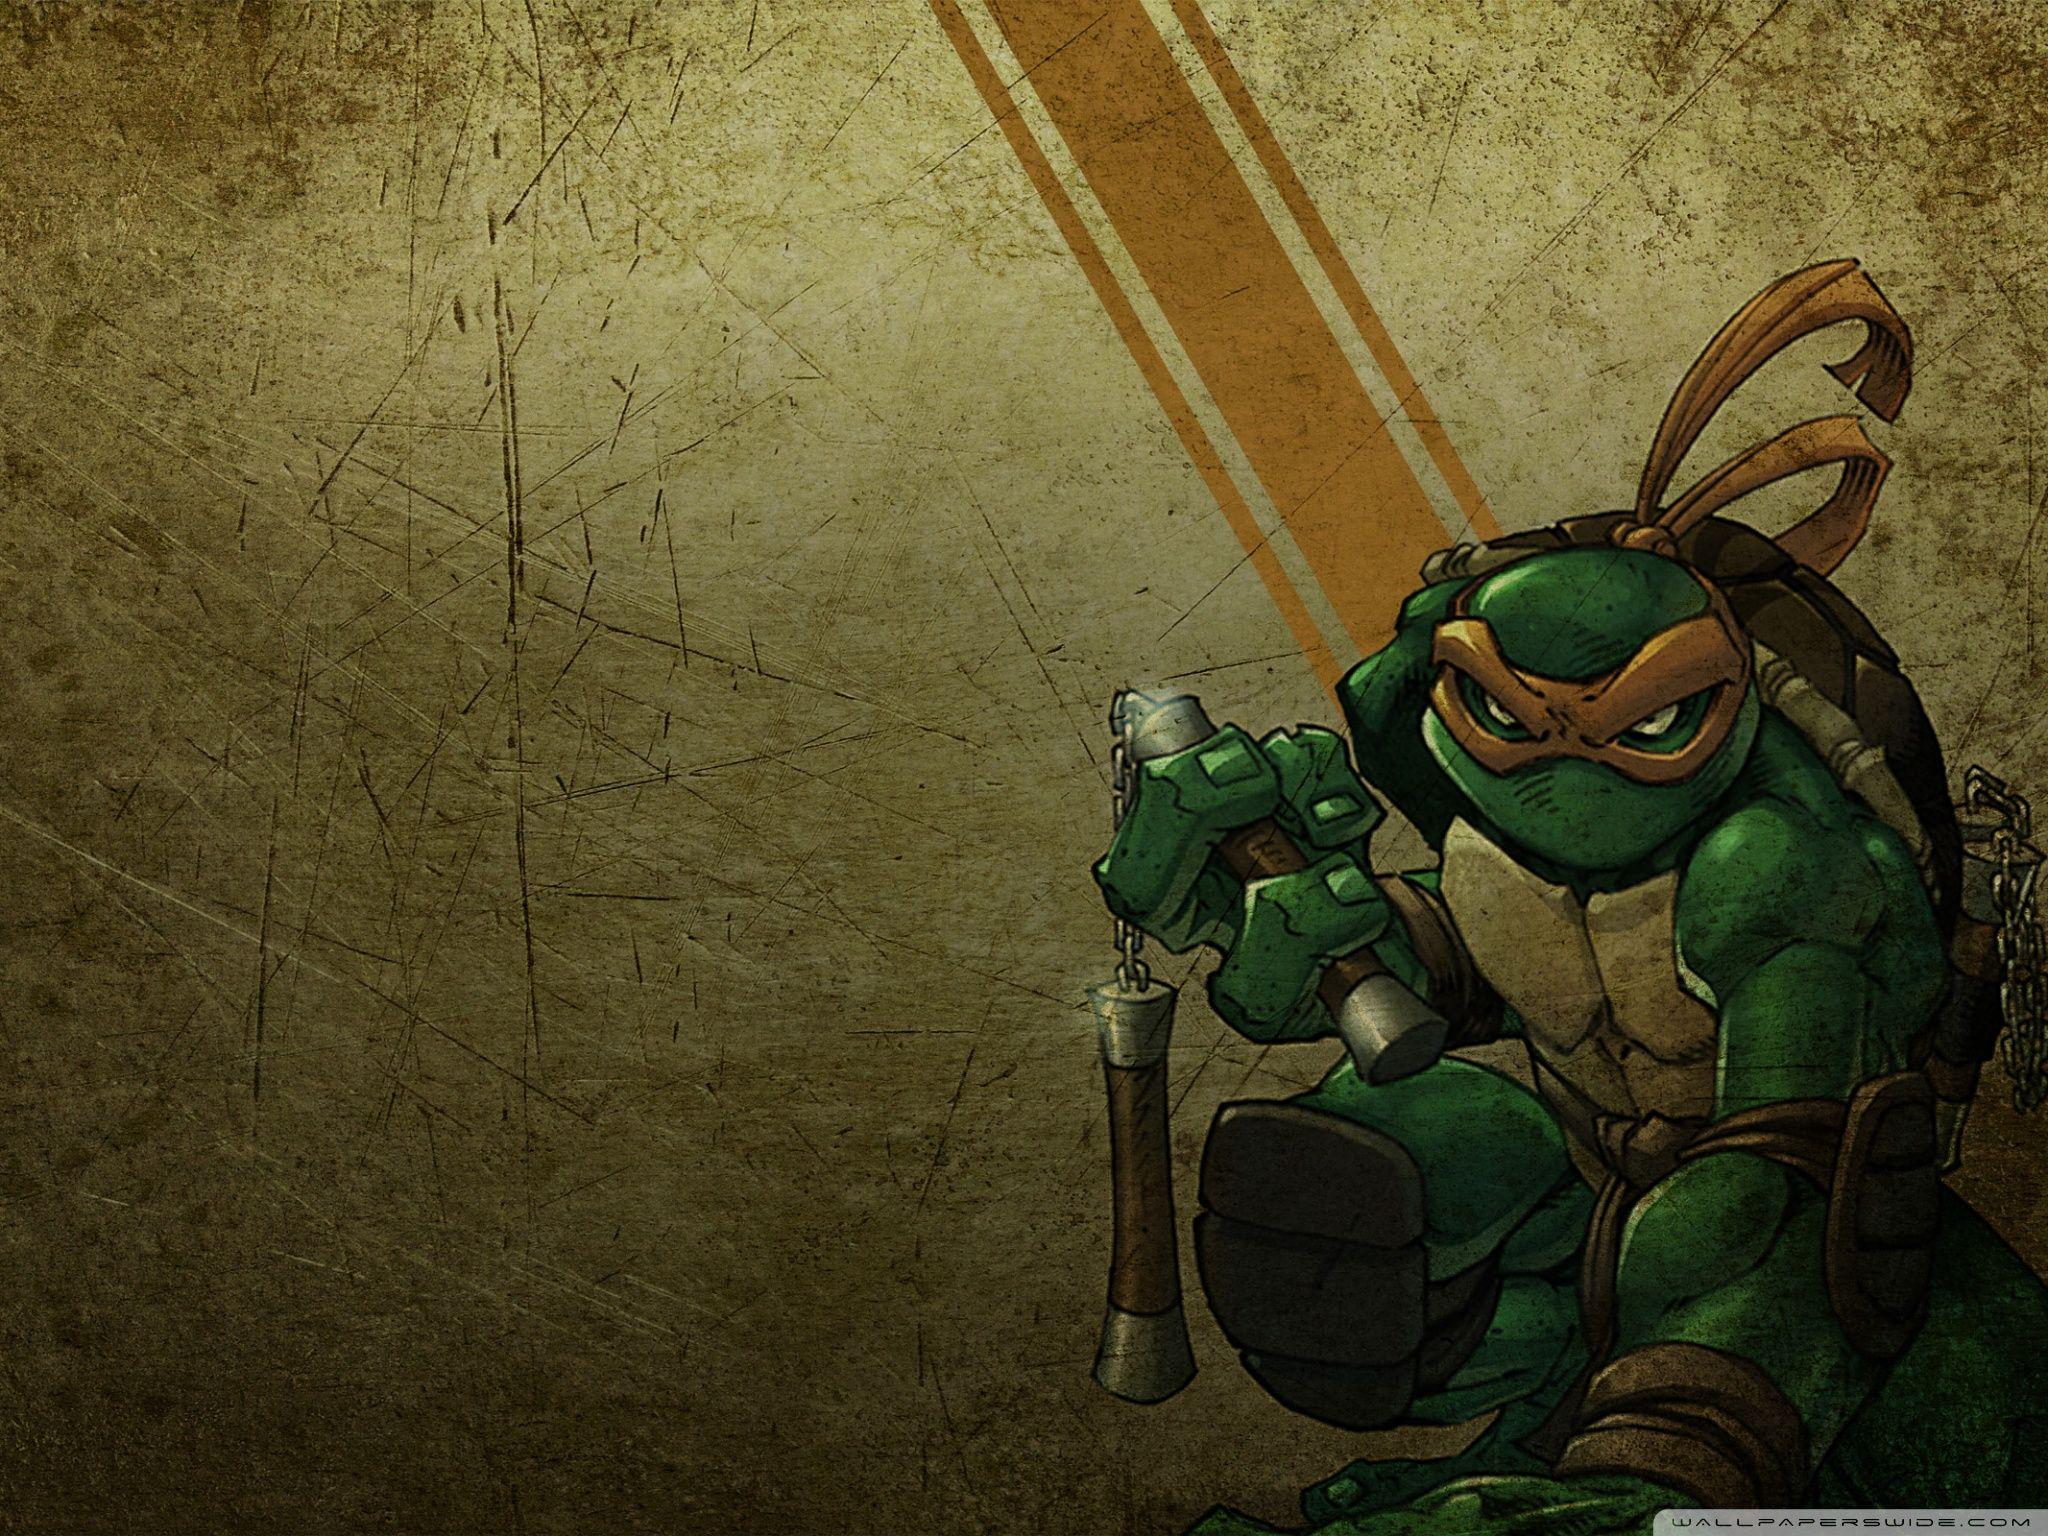 Teenage Mutant Ninja Turtles Wallpaper Collection For Free Download Tmnt Wallpaper Ninja Wallpaper Ninja Turtles